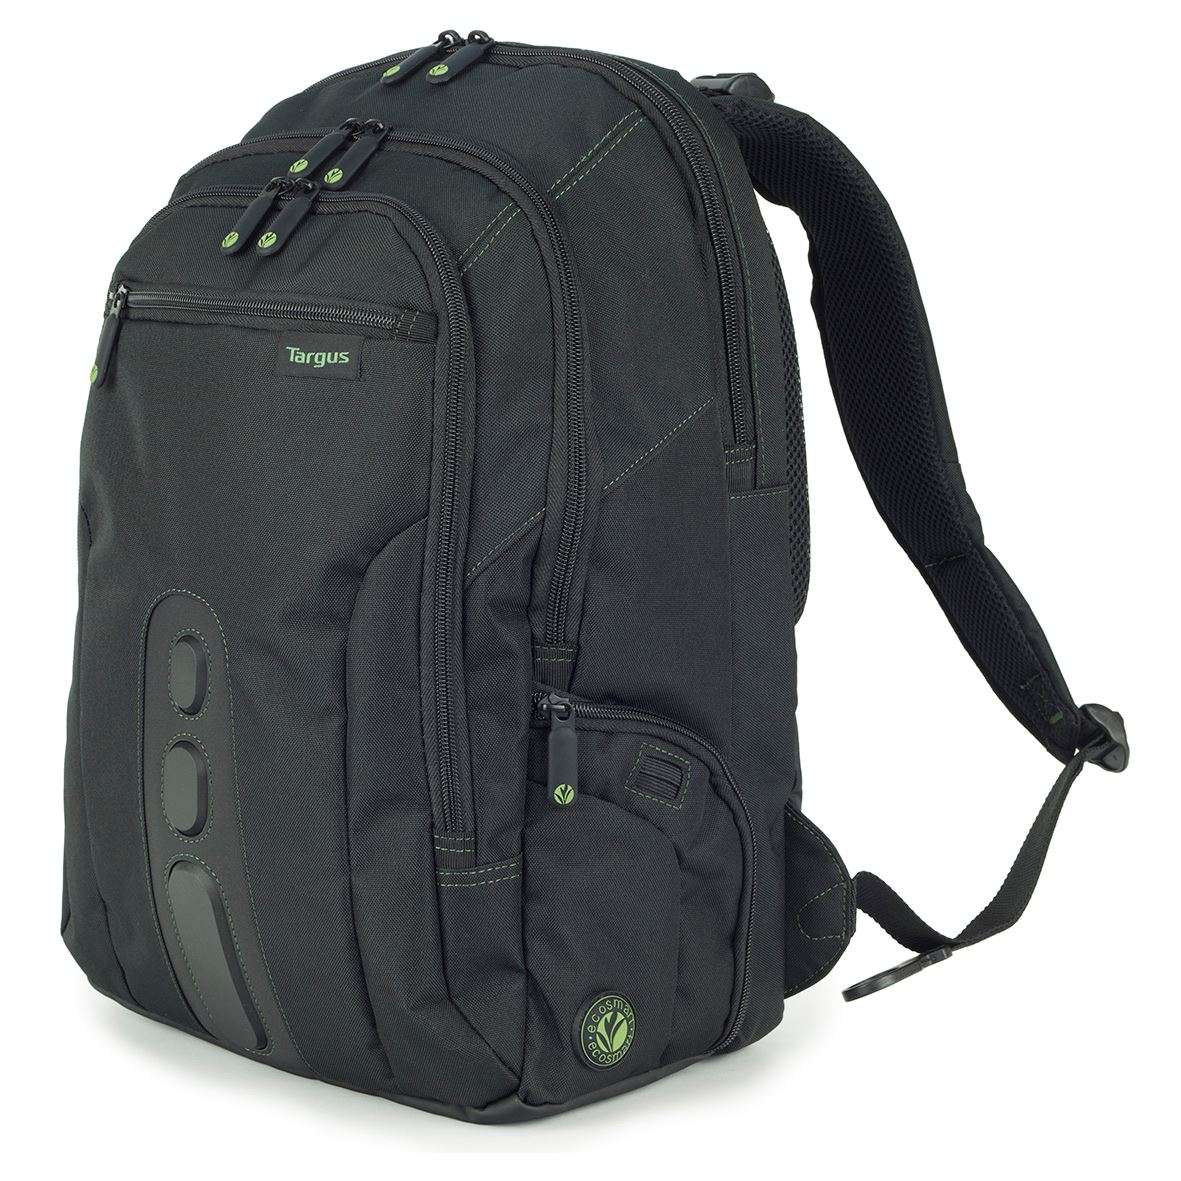 ecospruce sac dos pour ordinateur portable 15 6 noir. Black Bedroom Furniture Sets. Home Design Ideas